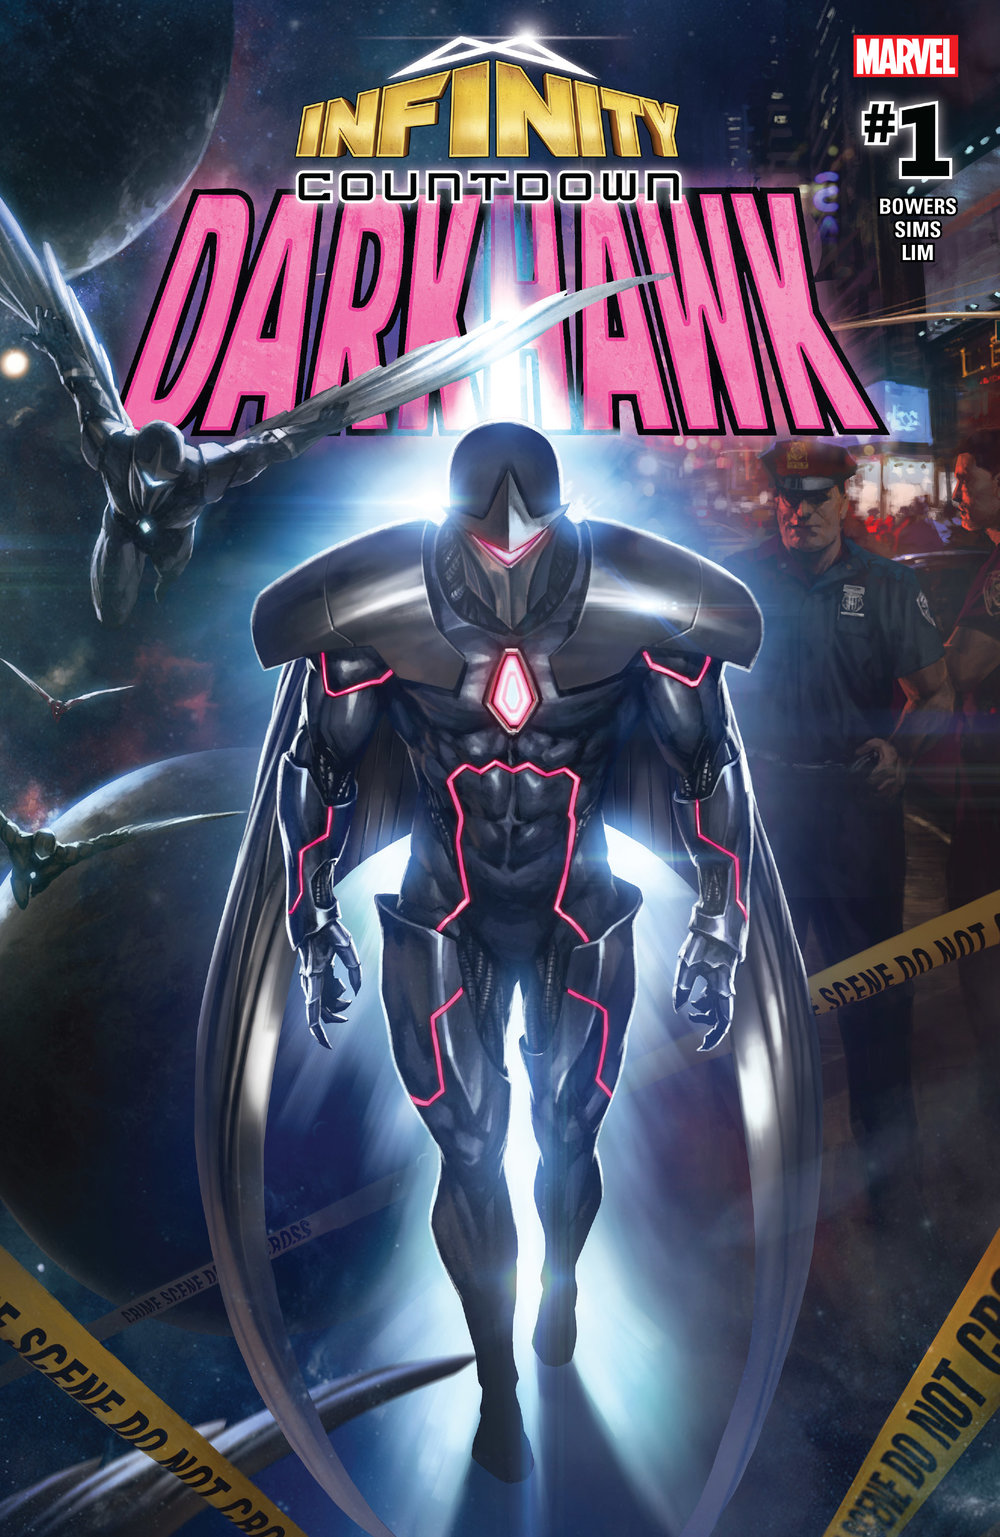 Infinity Countdown - Darkhawk (2018-) 001-000.jpg